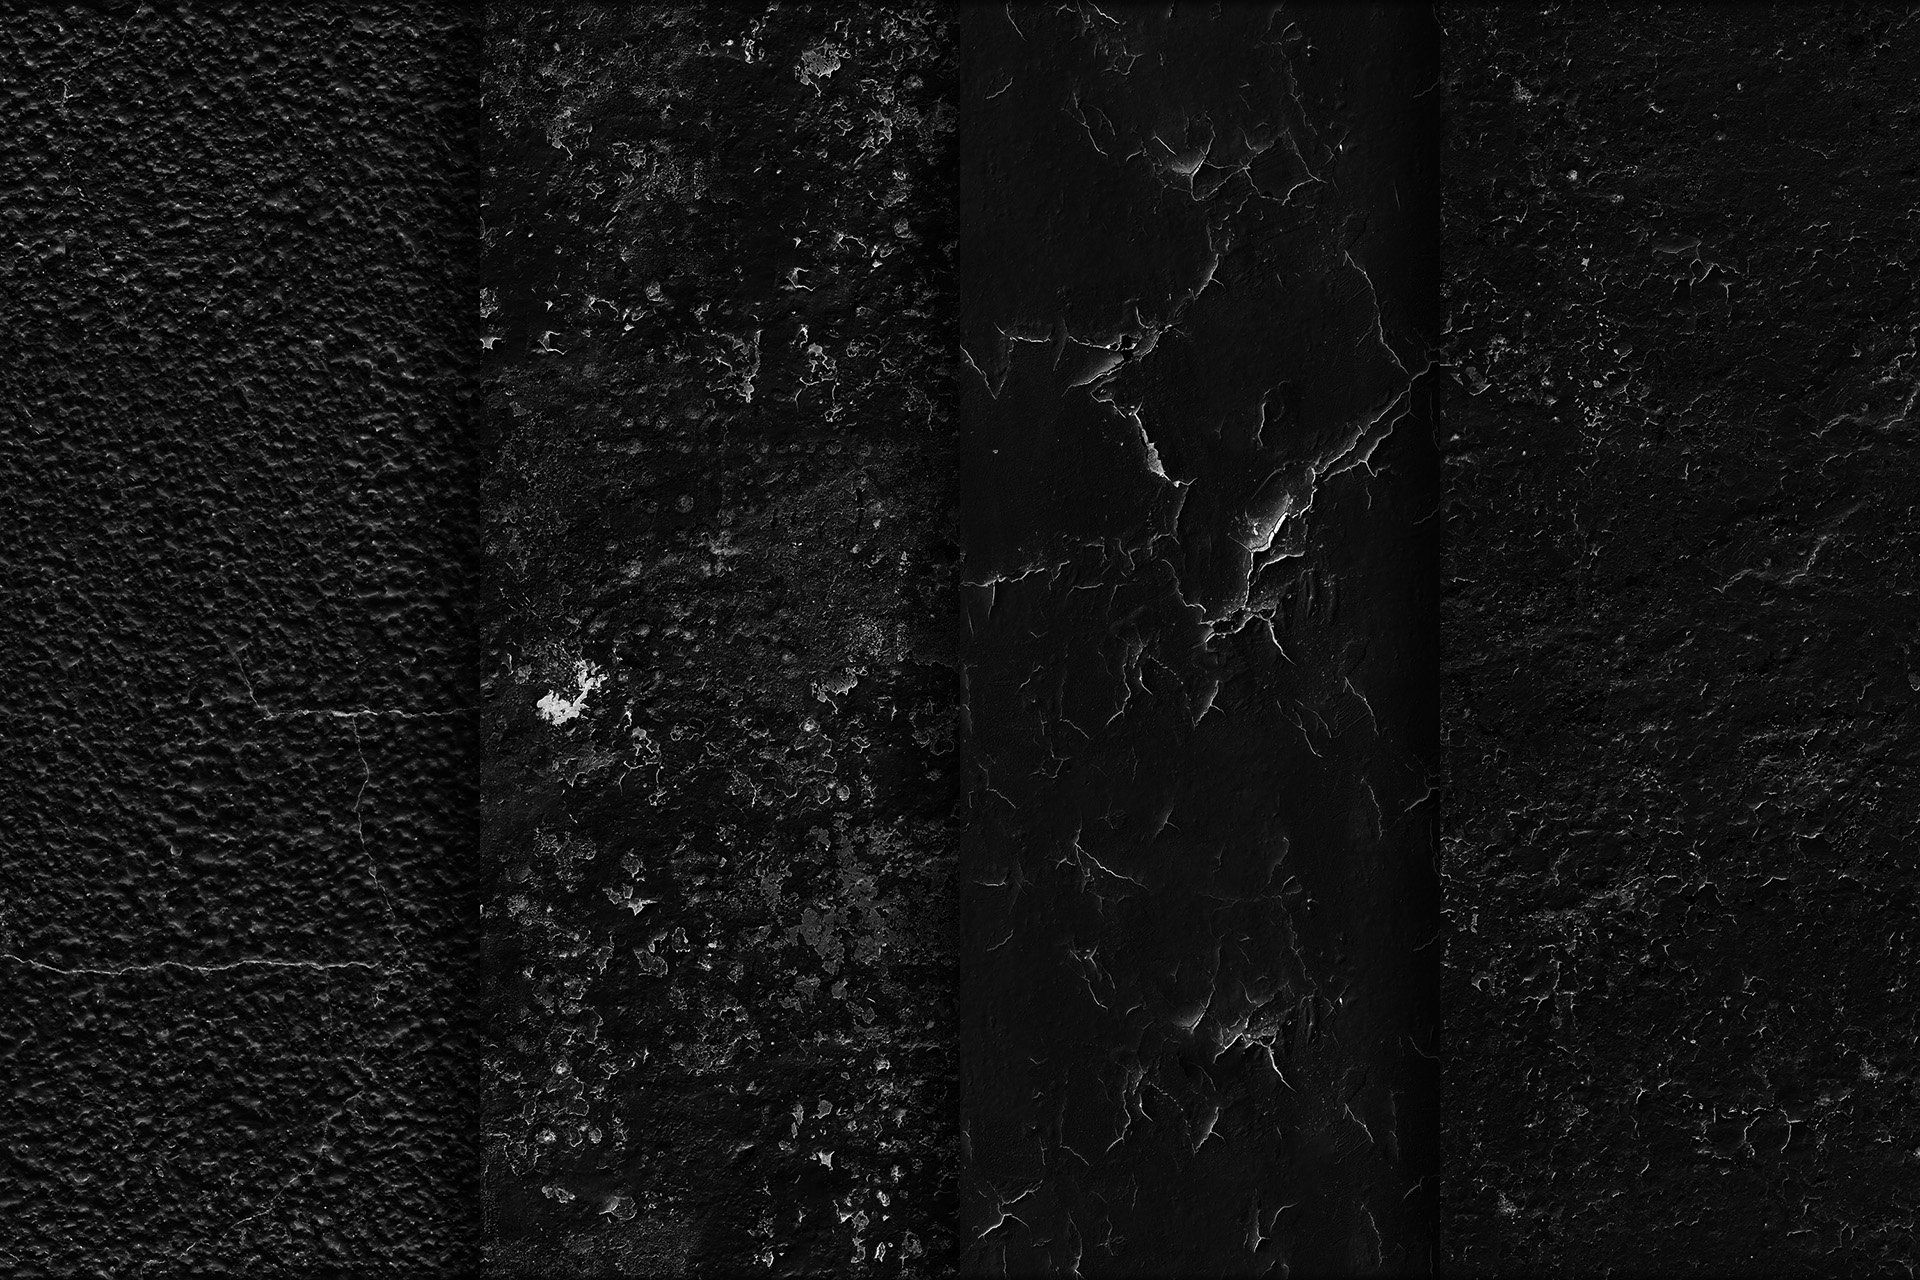 20 Black Walls Seamless Textures Seamless Textures Black Walls Texture